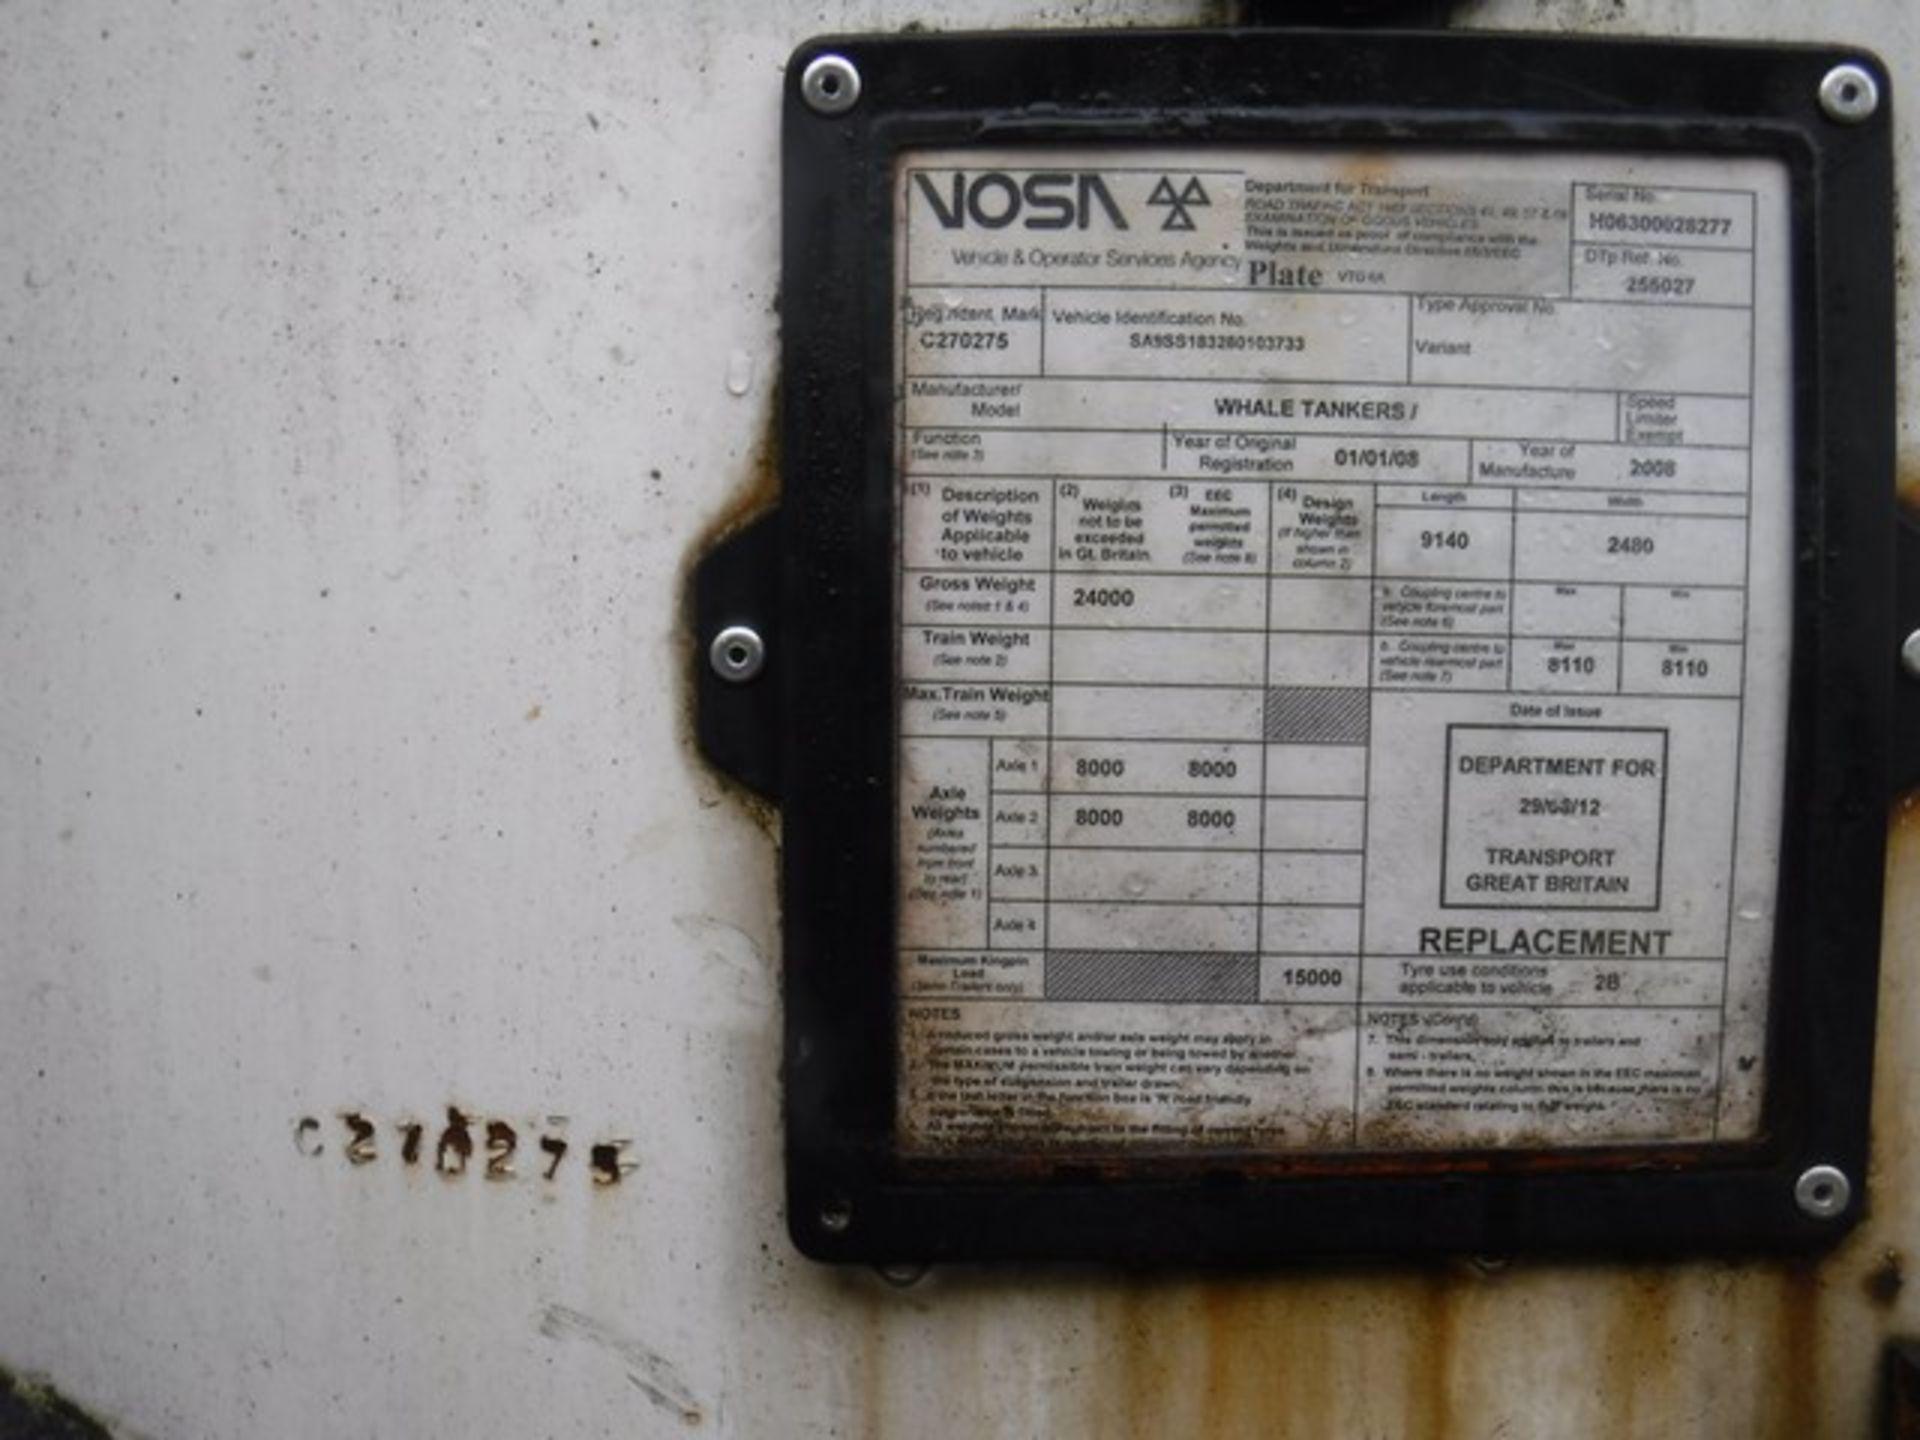 Lot 1605 - TANKER TRAILER 18000 LTR MAN 2008 Twin Axle - WHALE BOWSER ASSET NO. - C270275